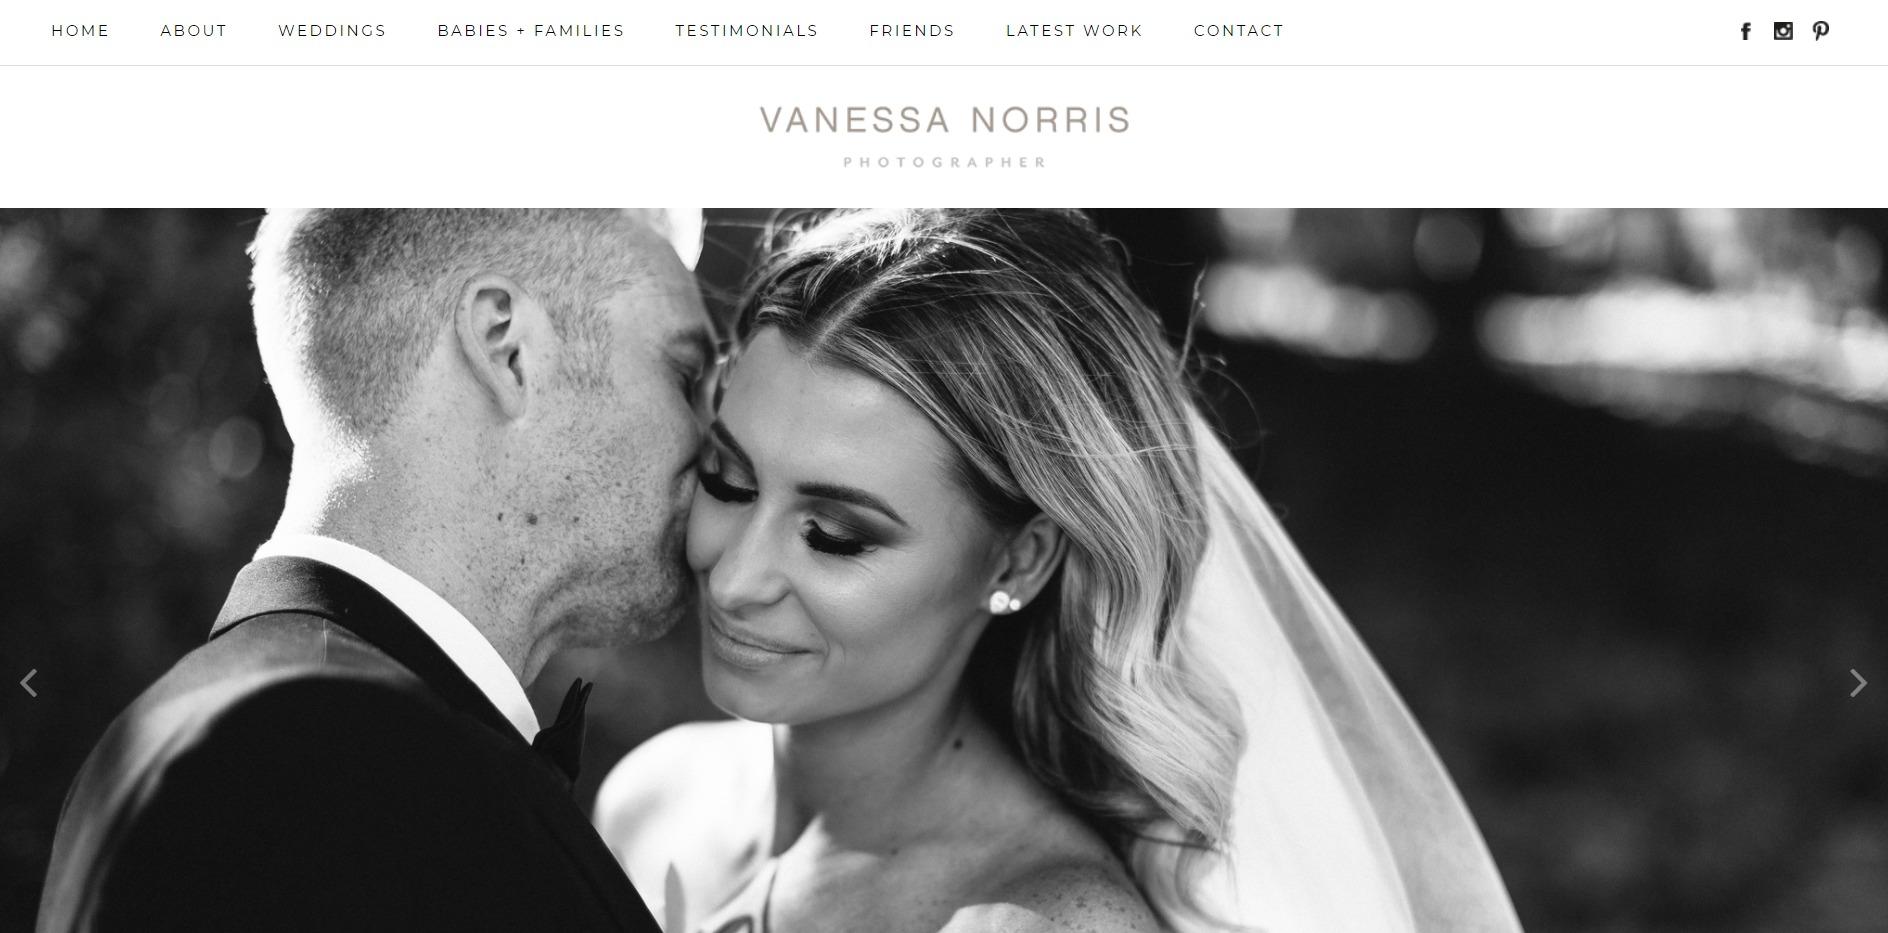 Vanessa Norris